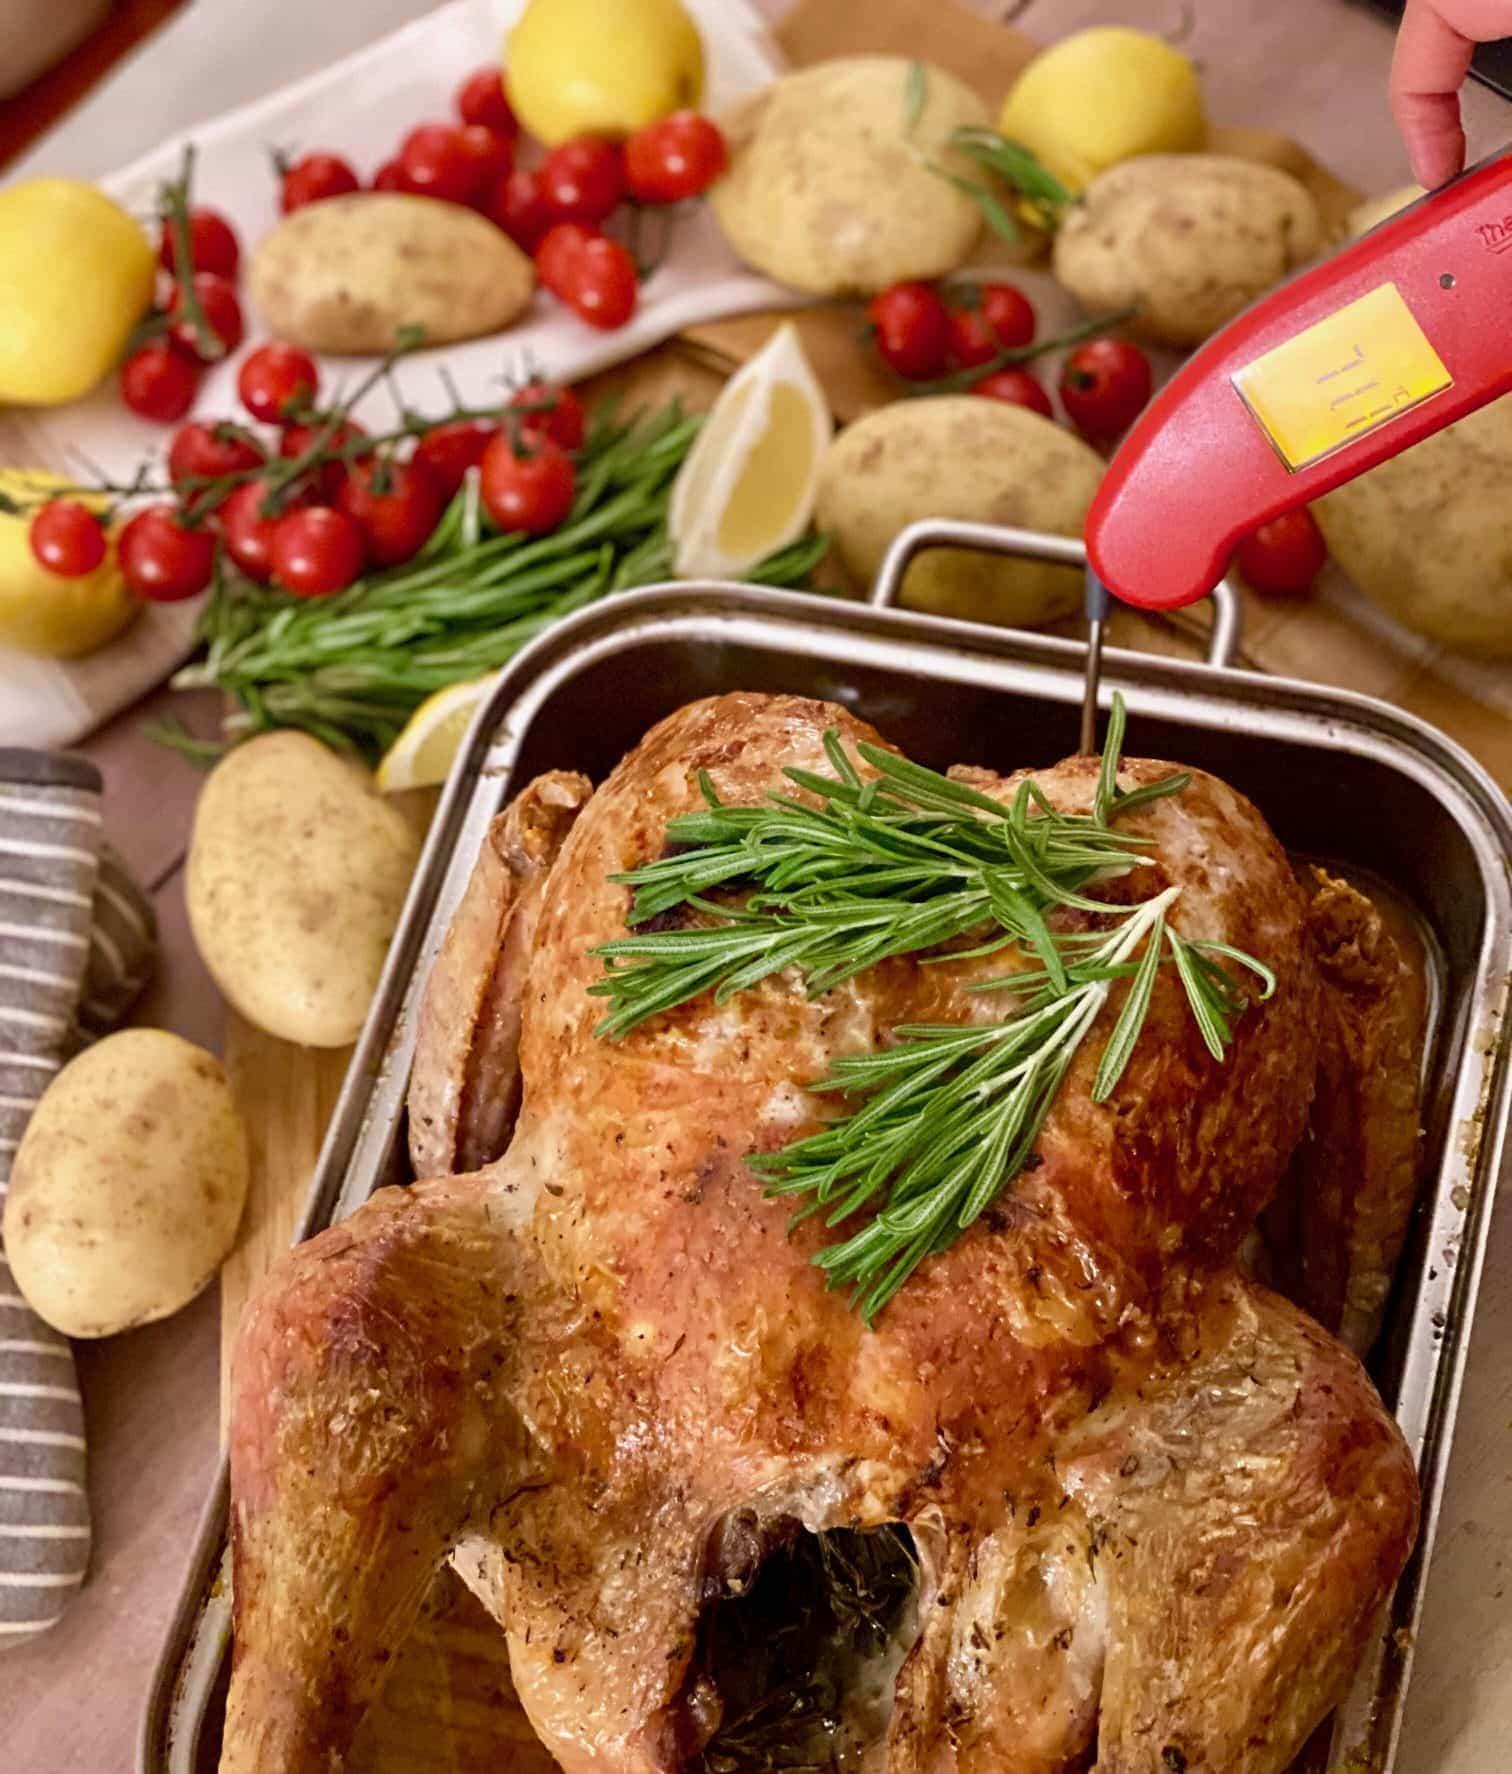 Measuring temperature of turkey resting in pan